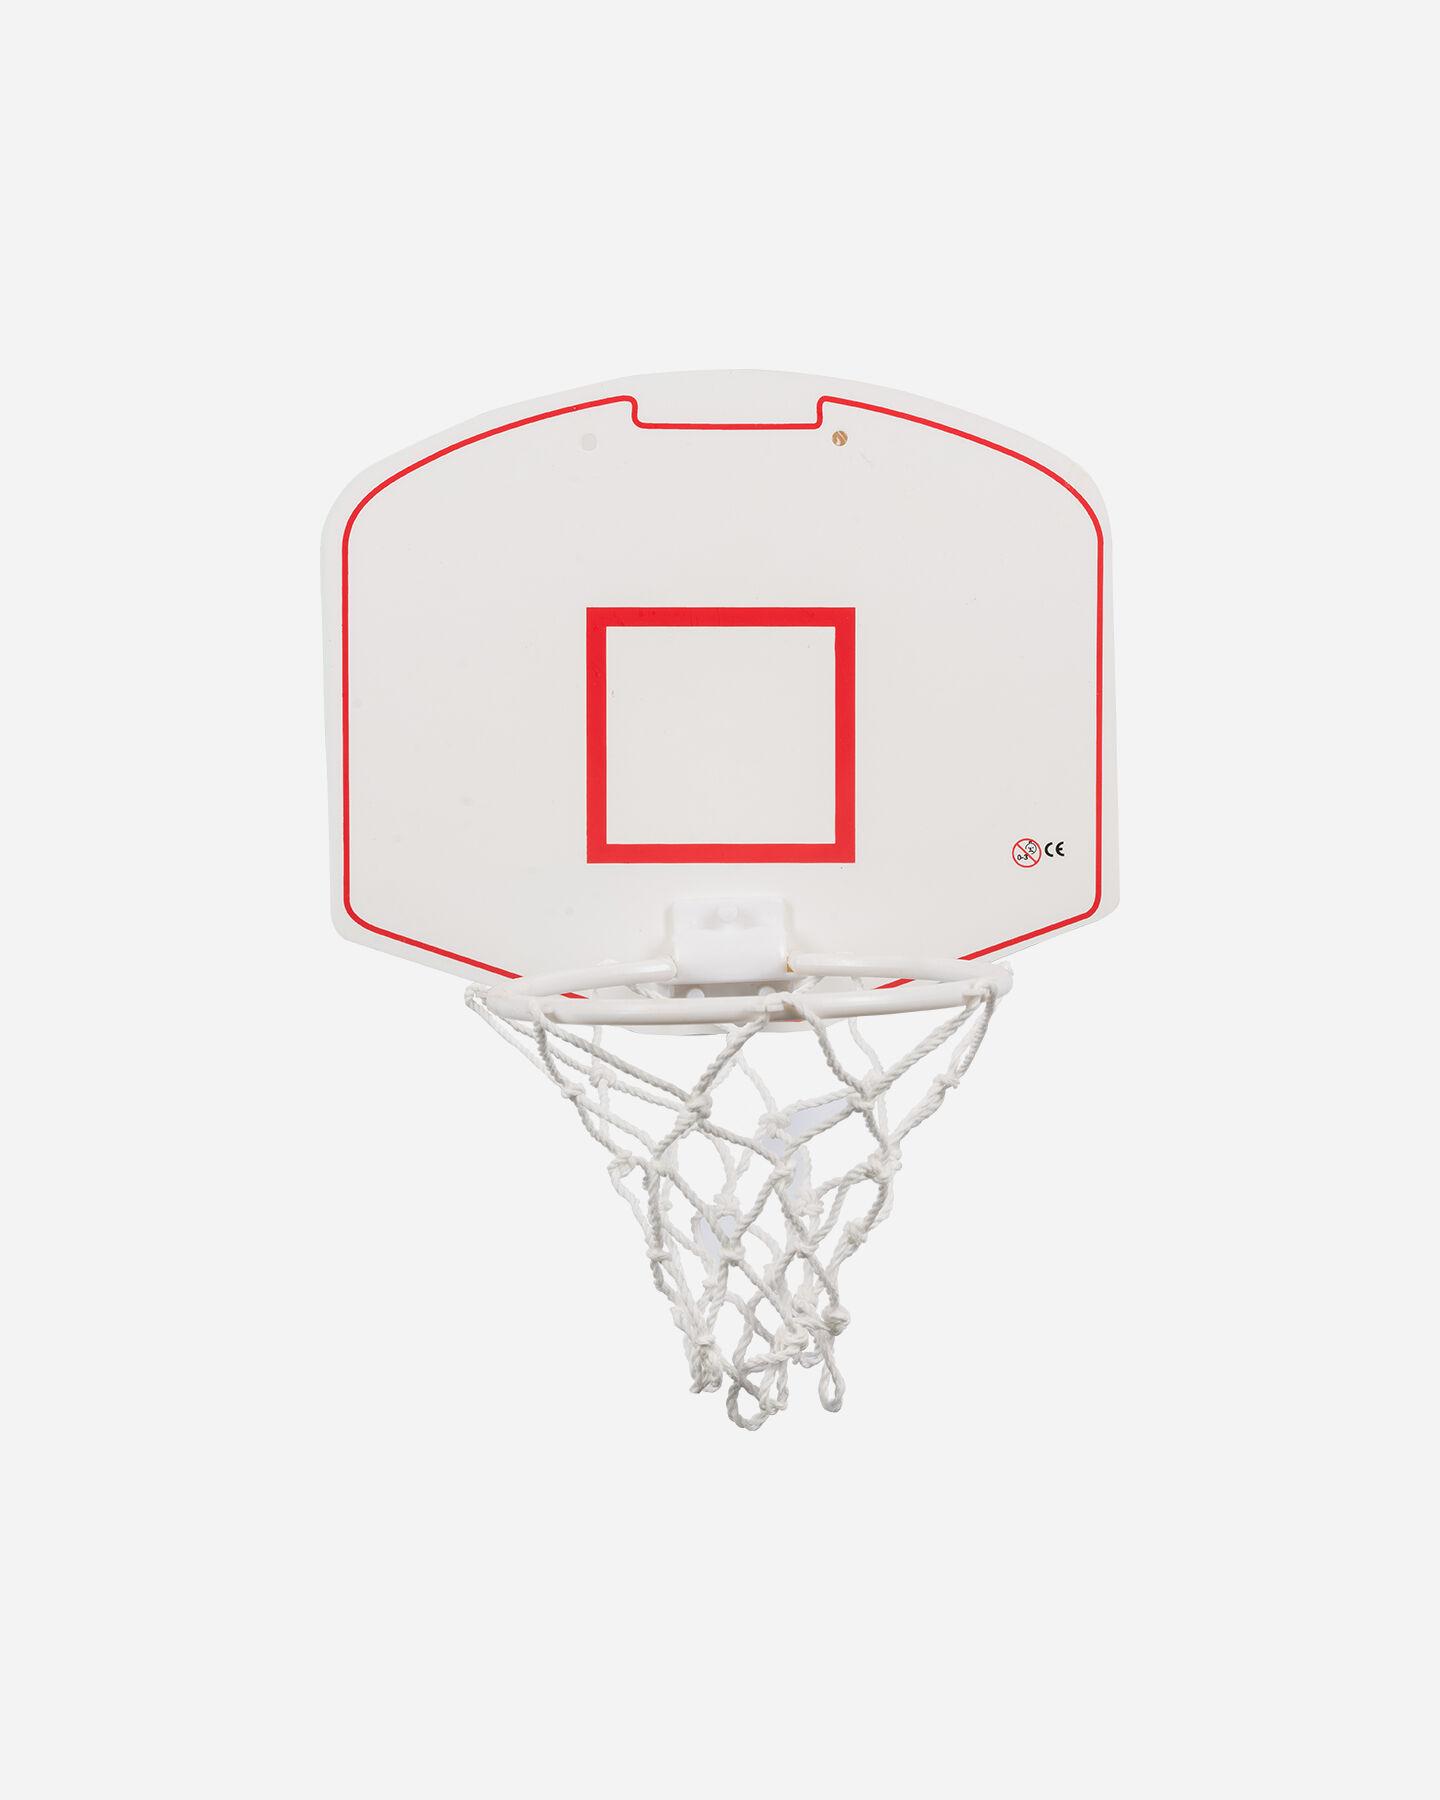 Canestro tabellone basket PRO TOUCH SET MINI BASKETBALL JR S2000104|900|- scatto 0